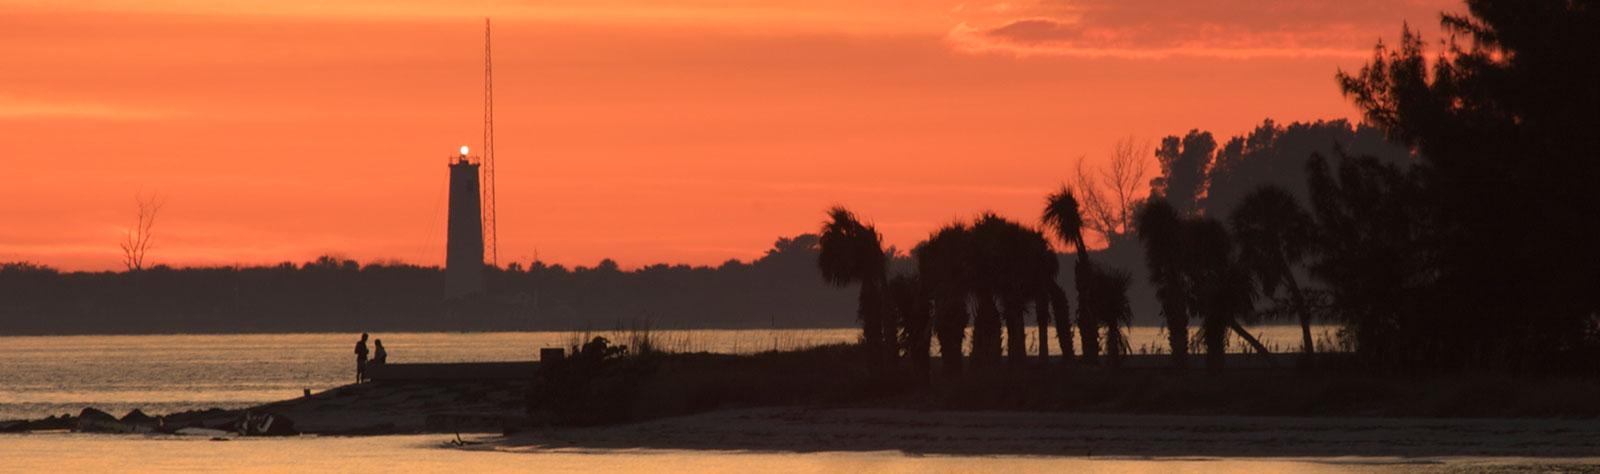 Egmont Key State Park at Florida